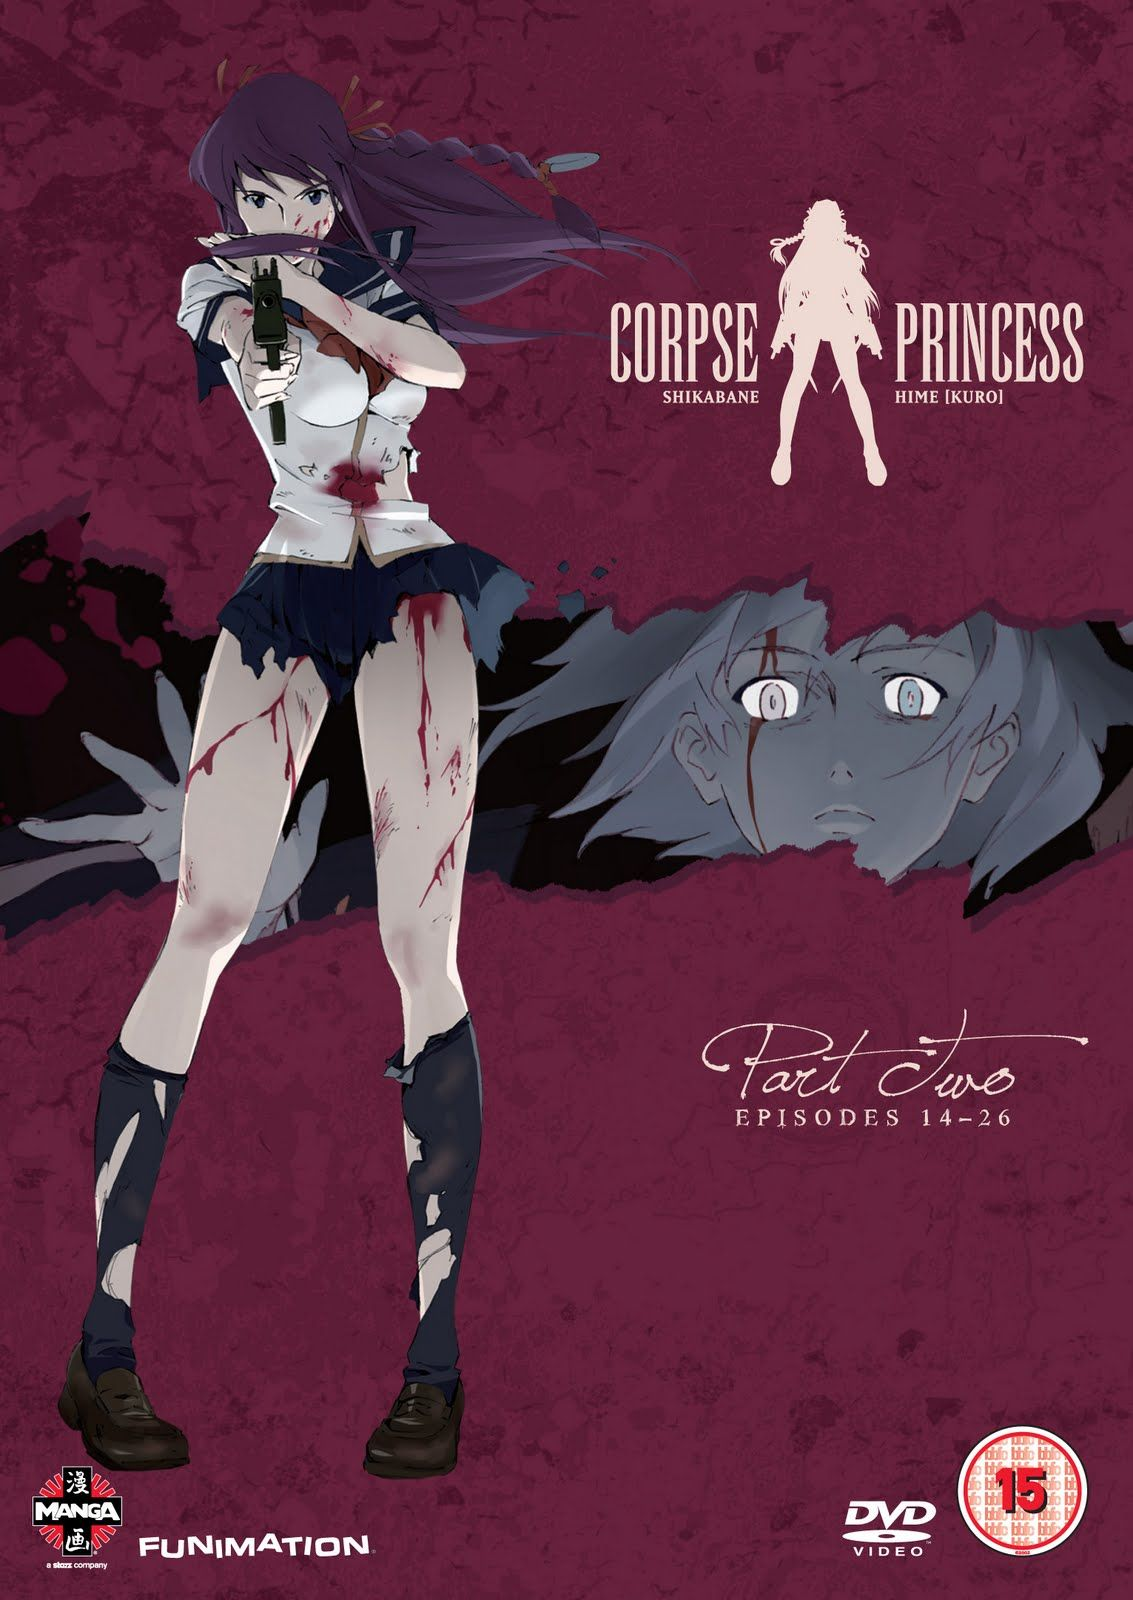 Makina Hoshimura Shikabane hime Corpse princess, Anime